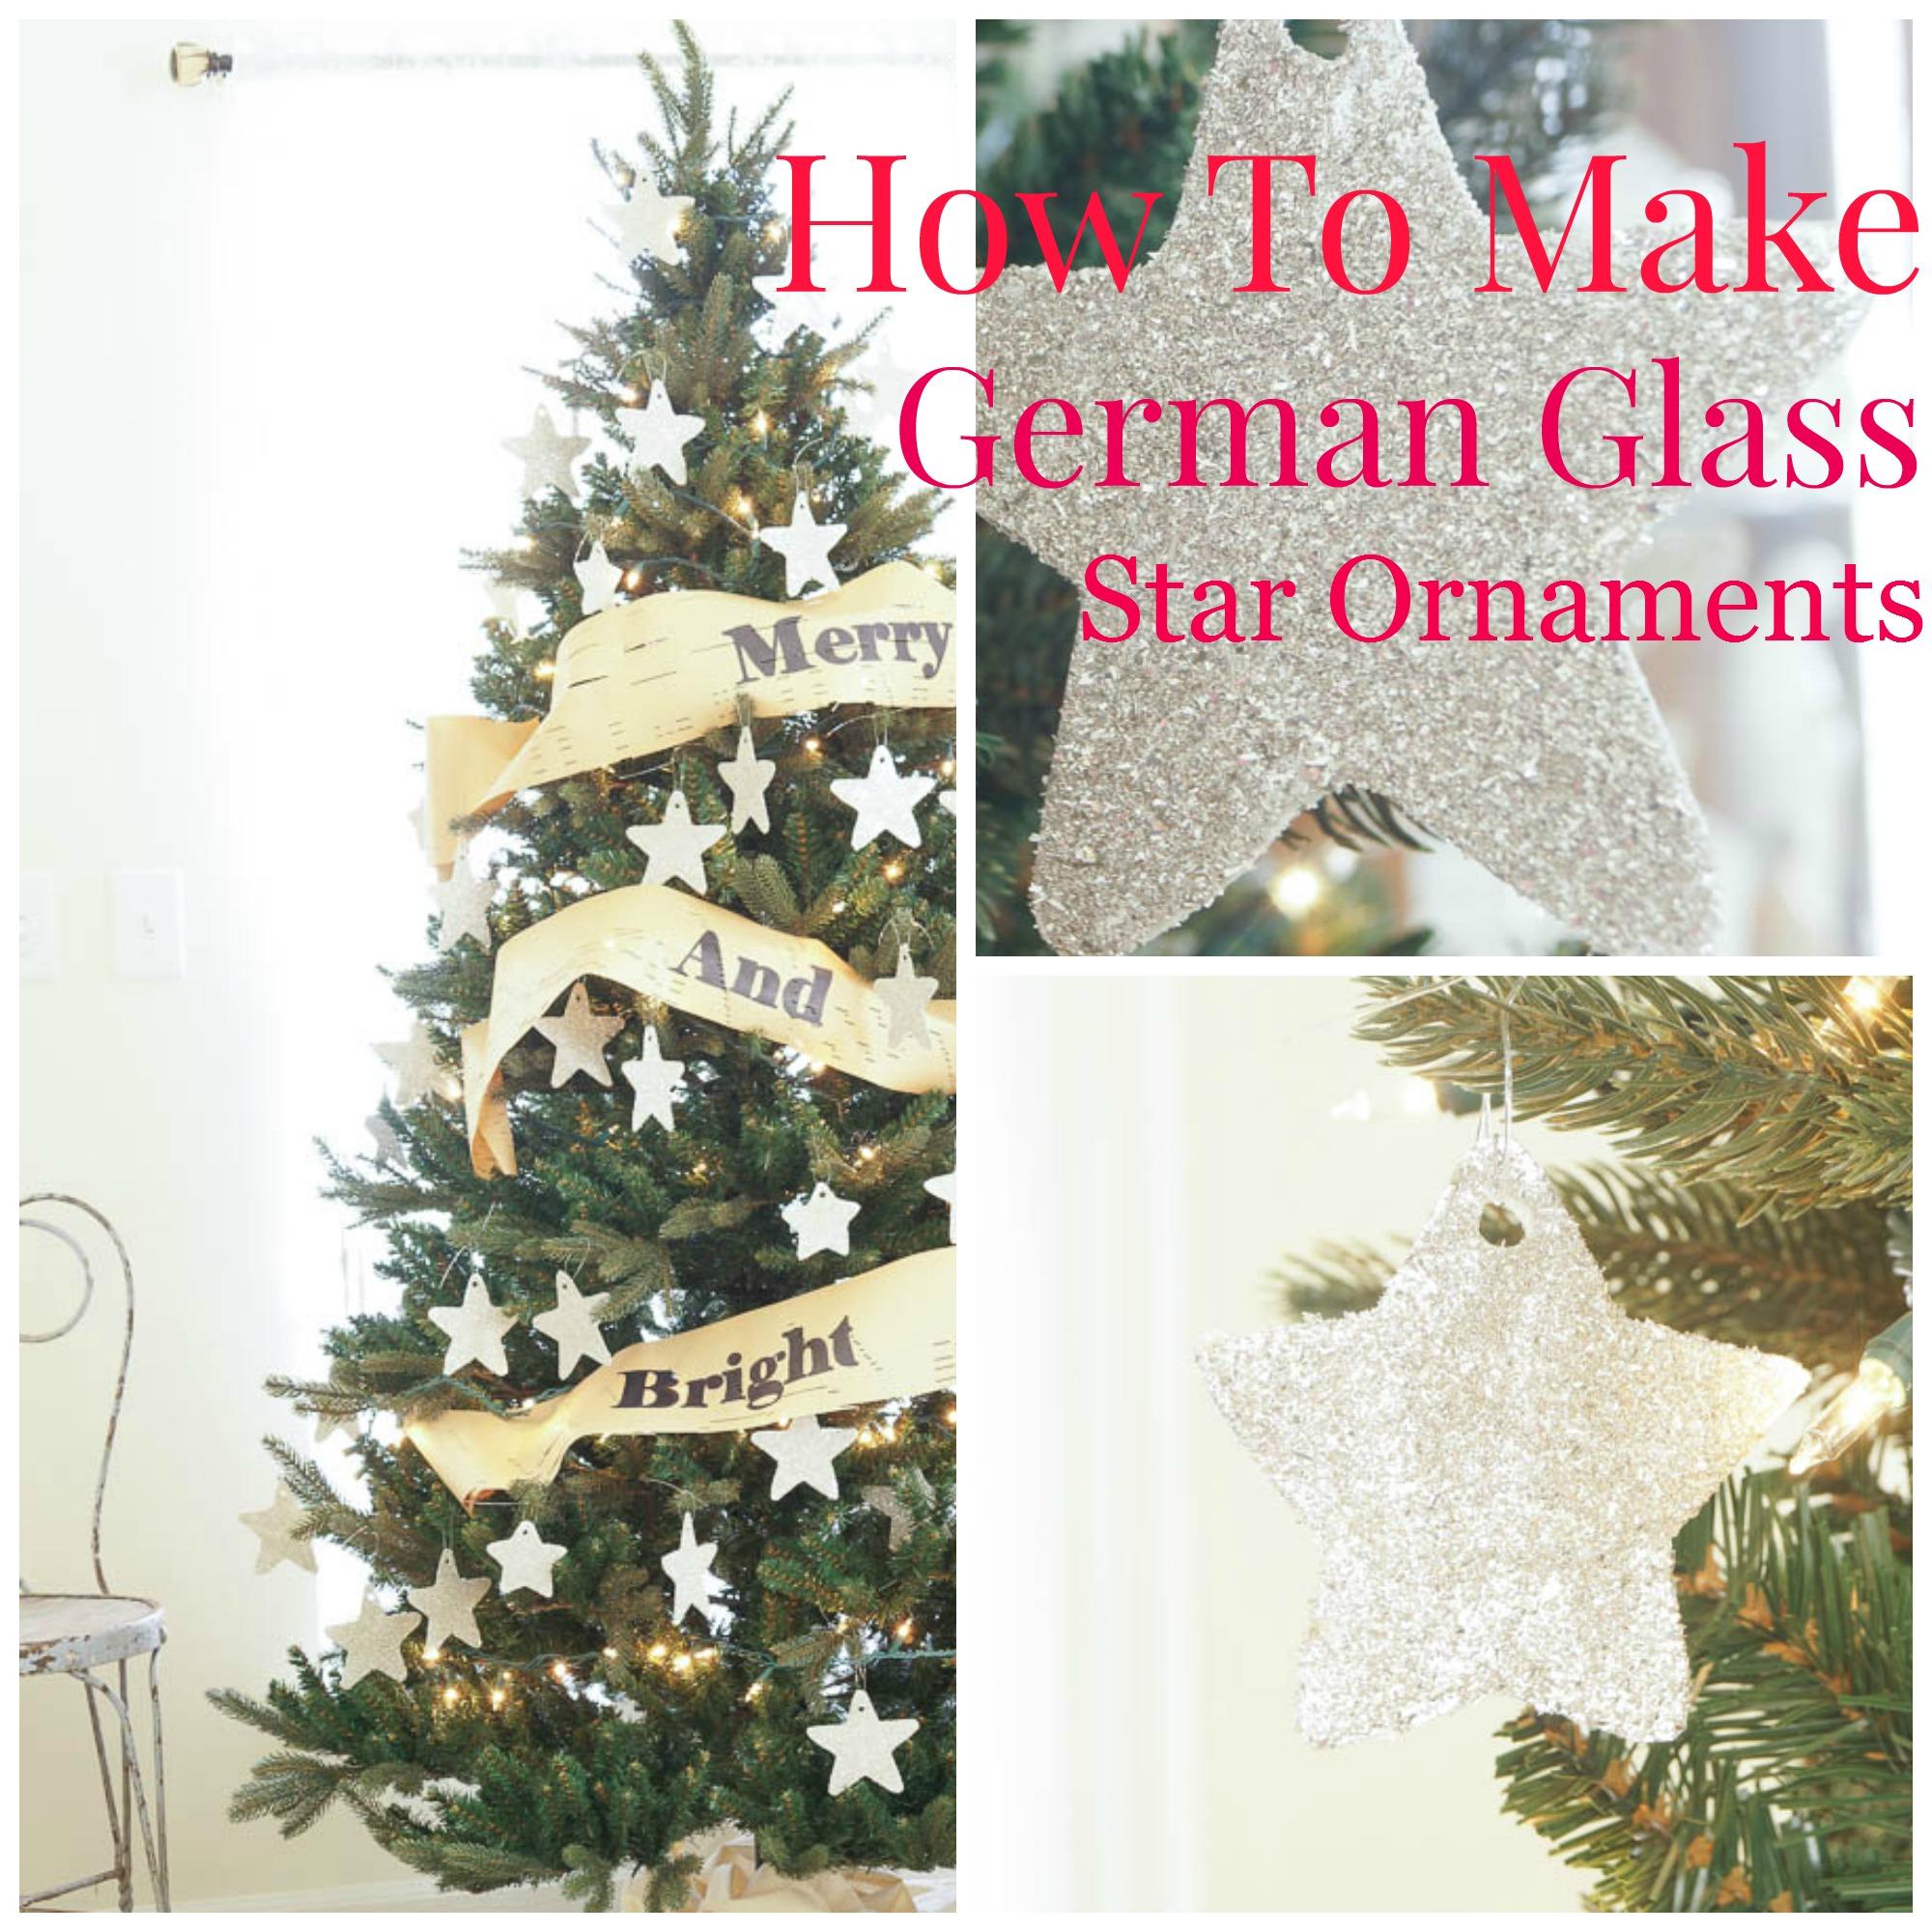 German glass ornaments - German Glass Star Ornaments 117e1f854597f1698c4fe38861134913signature